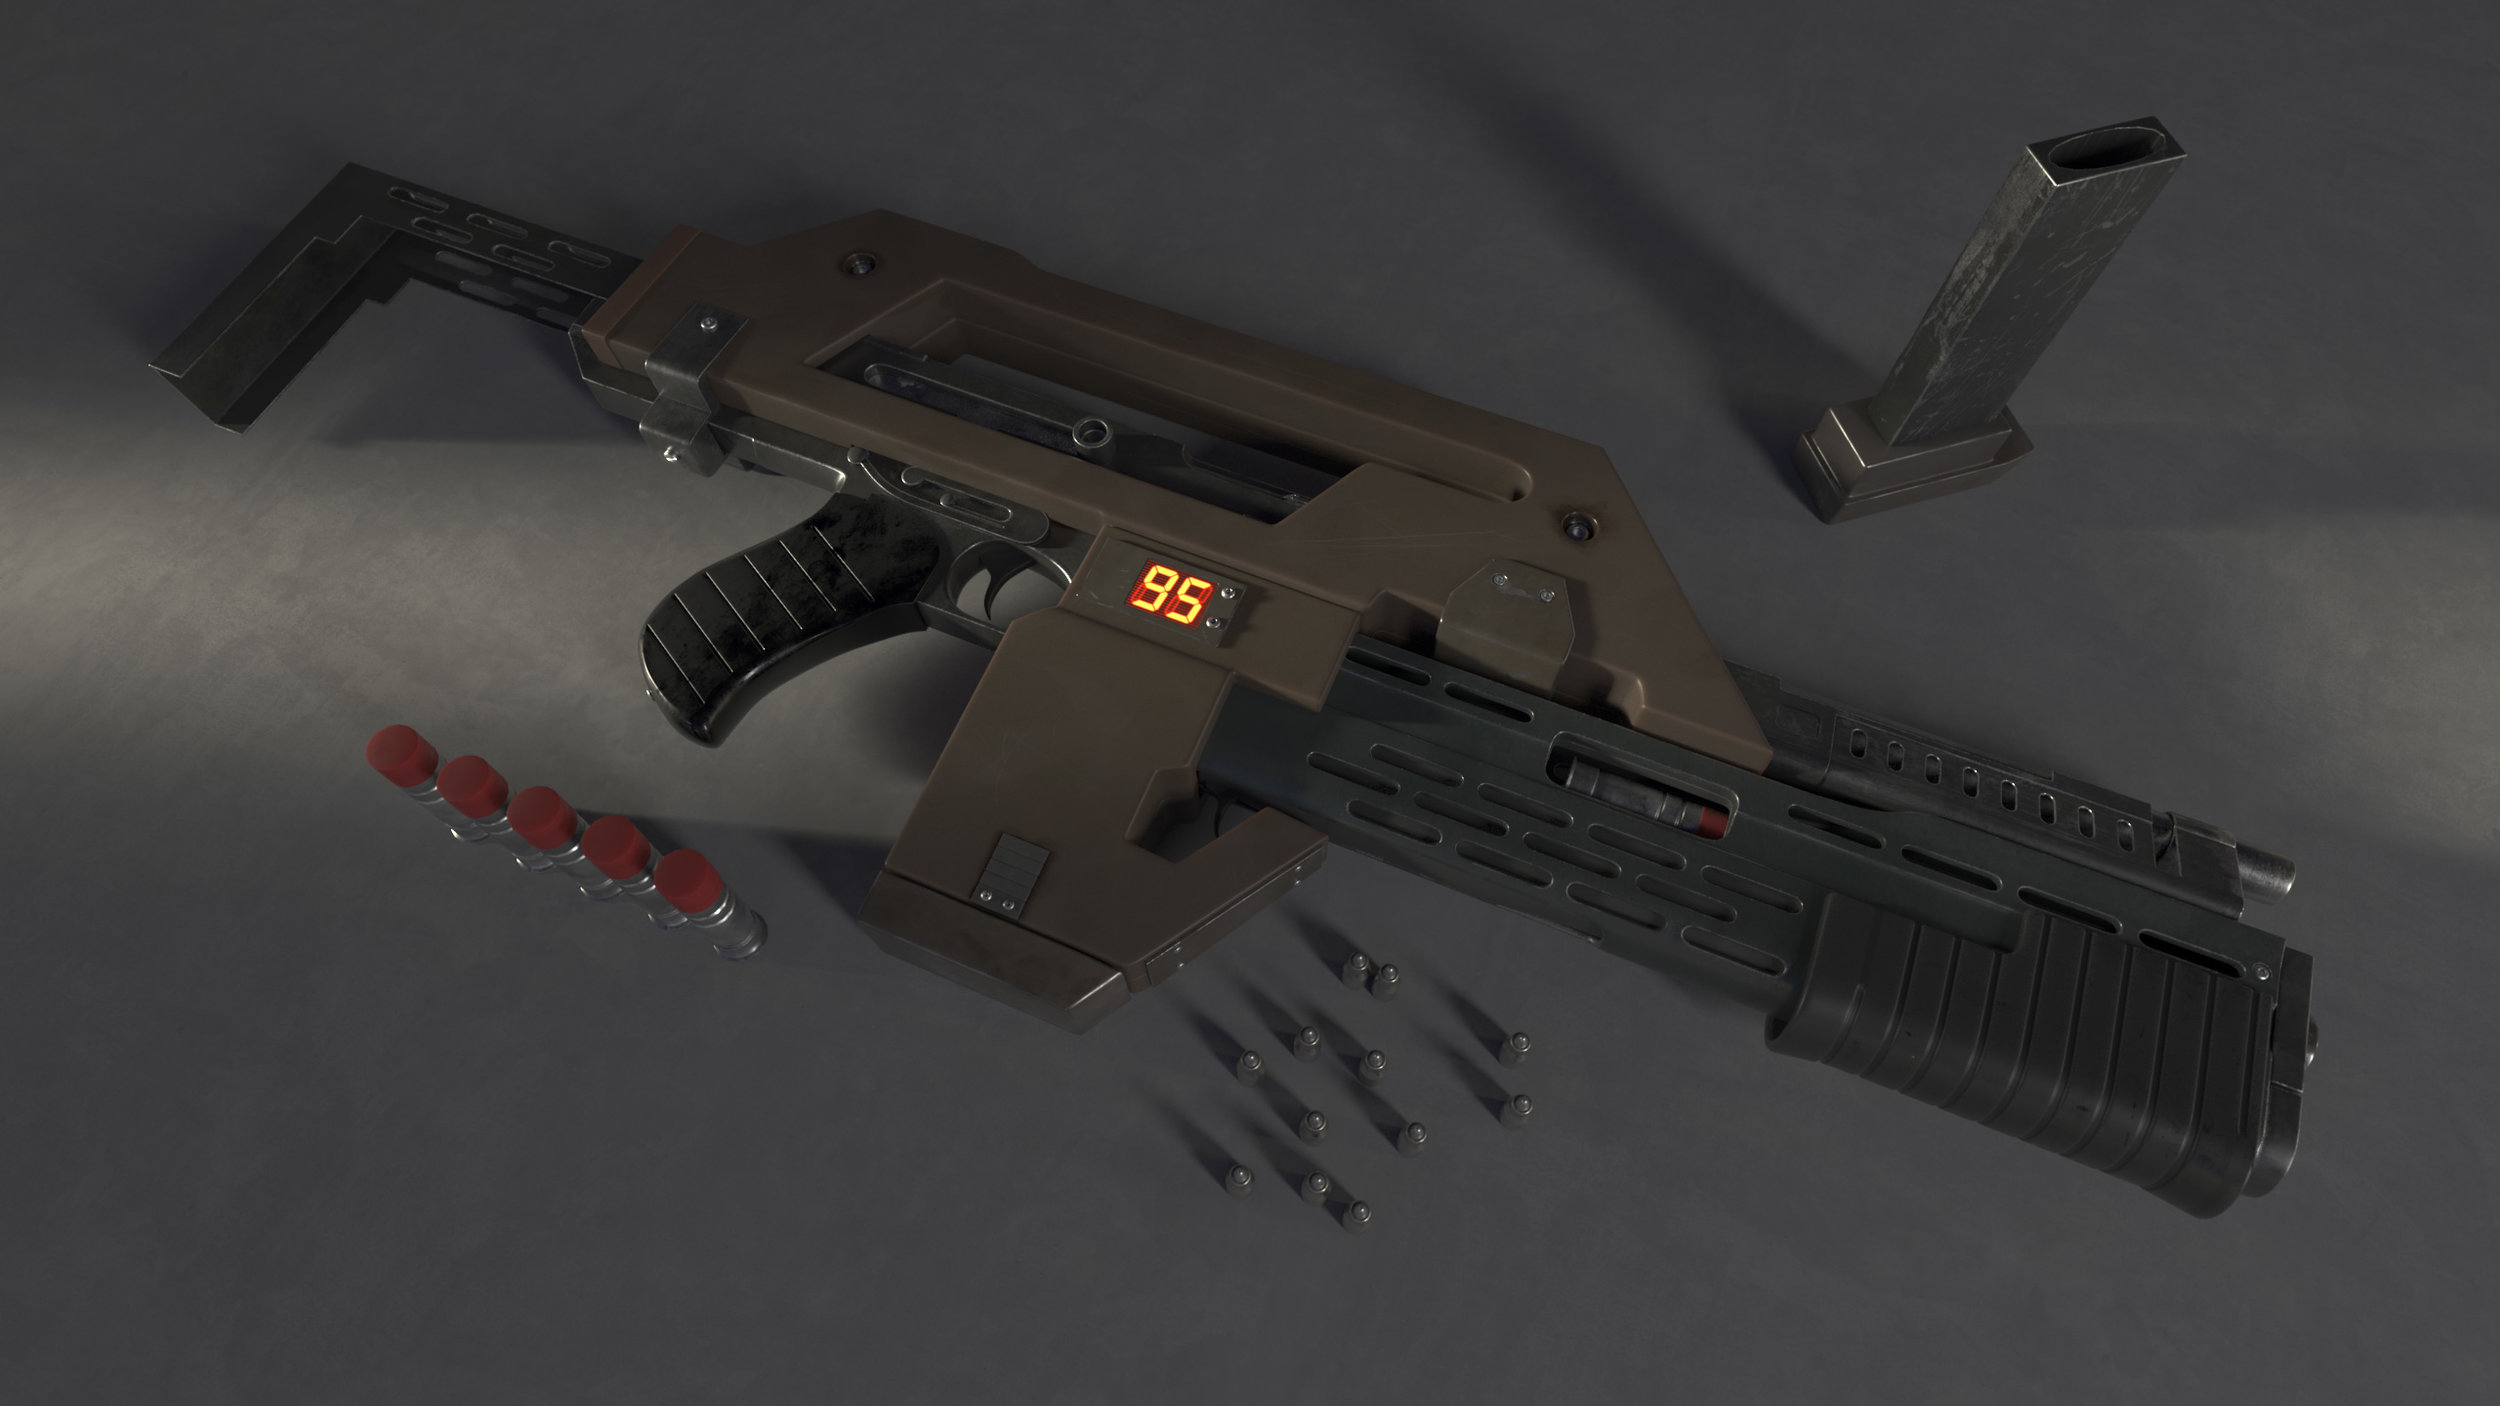 M41A_Arnold_Stg02A0000.jpg